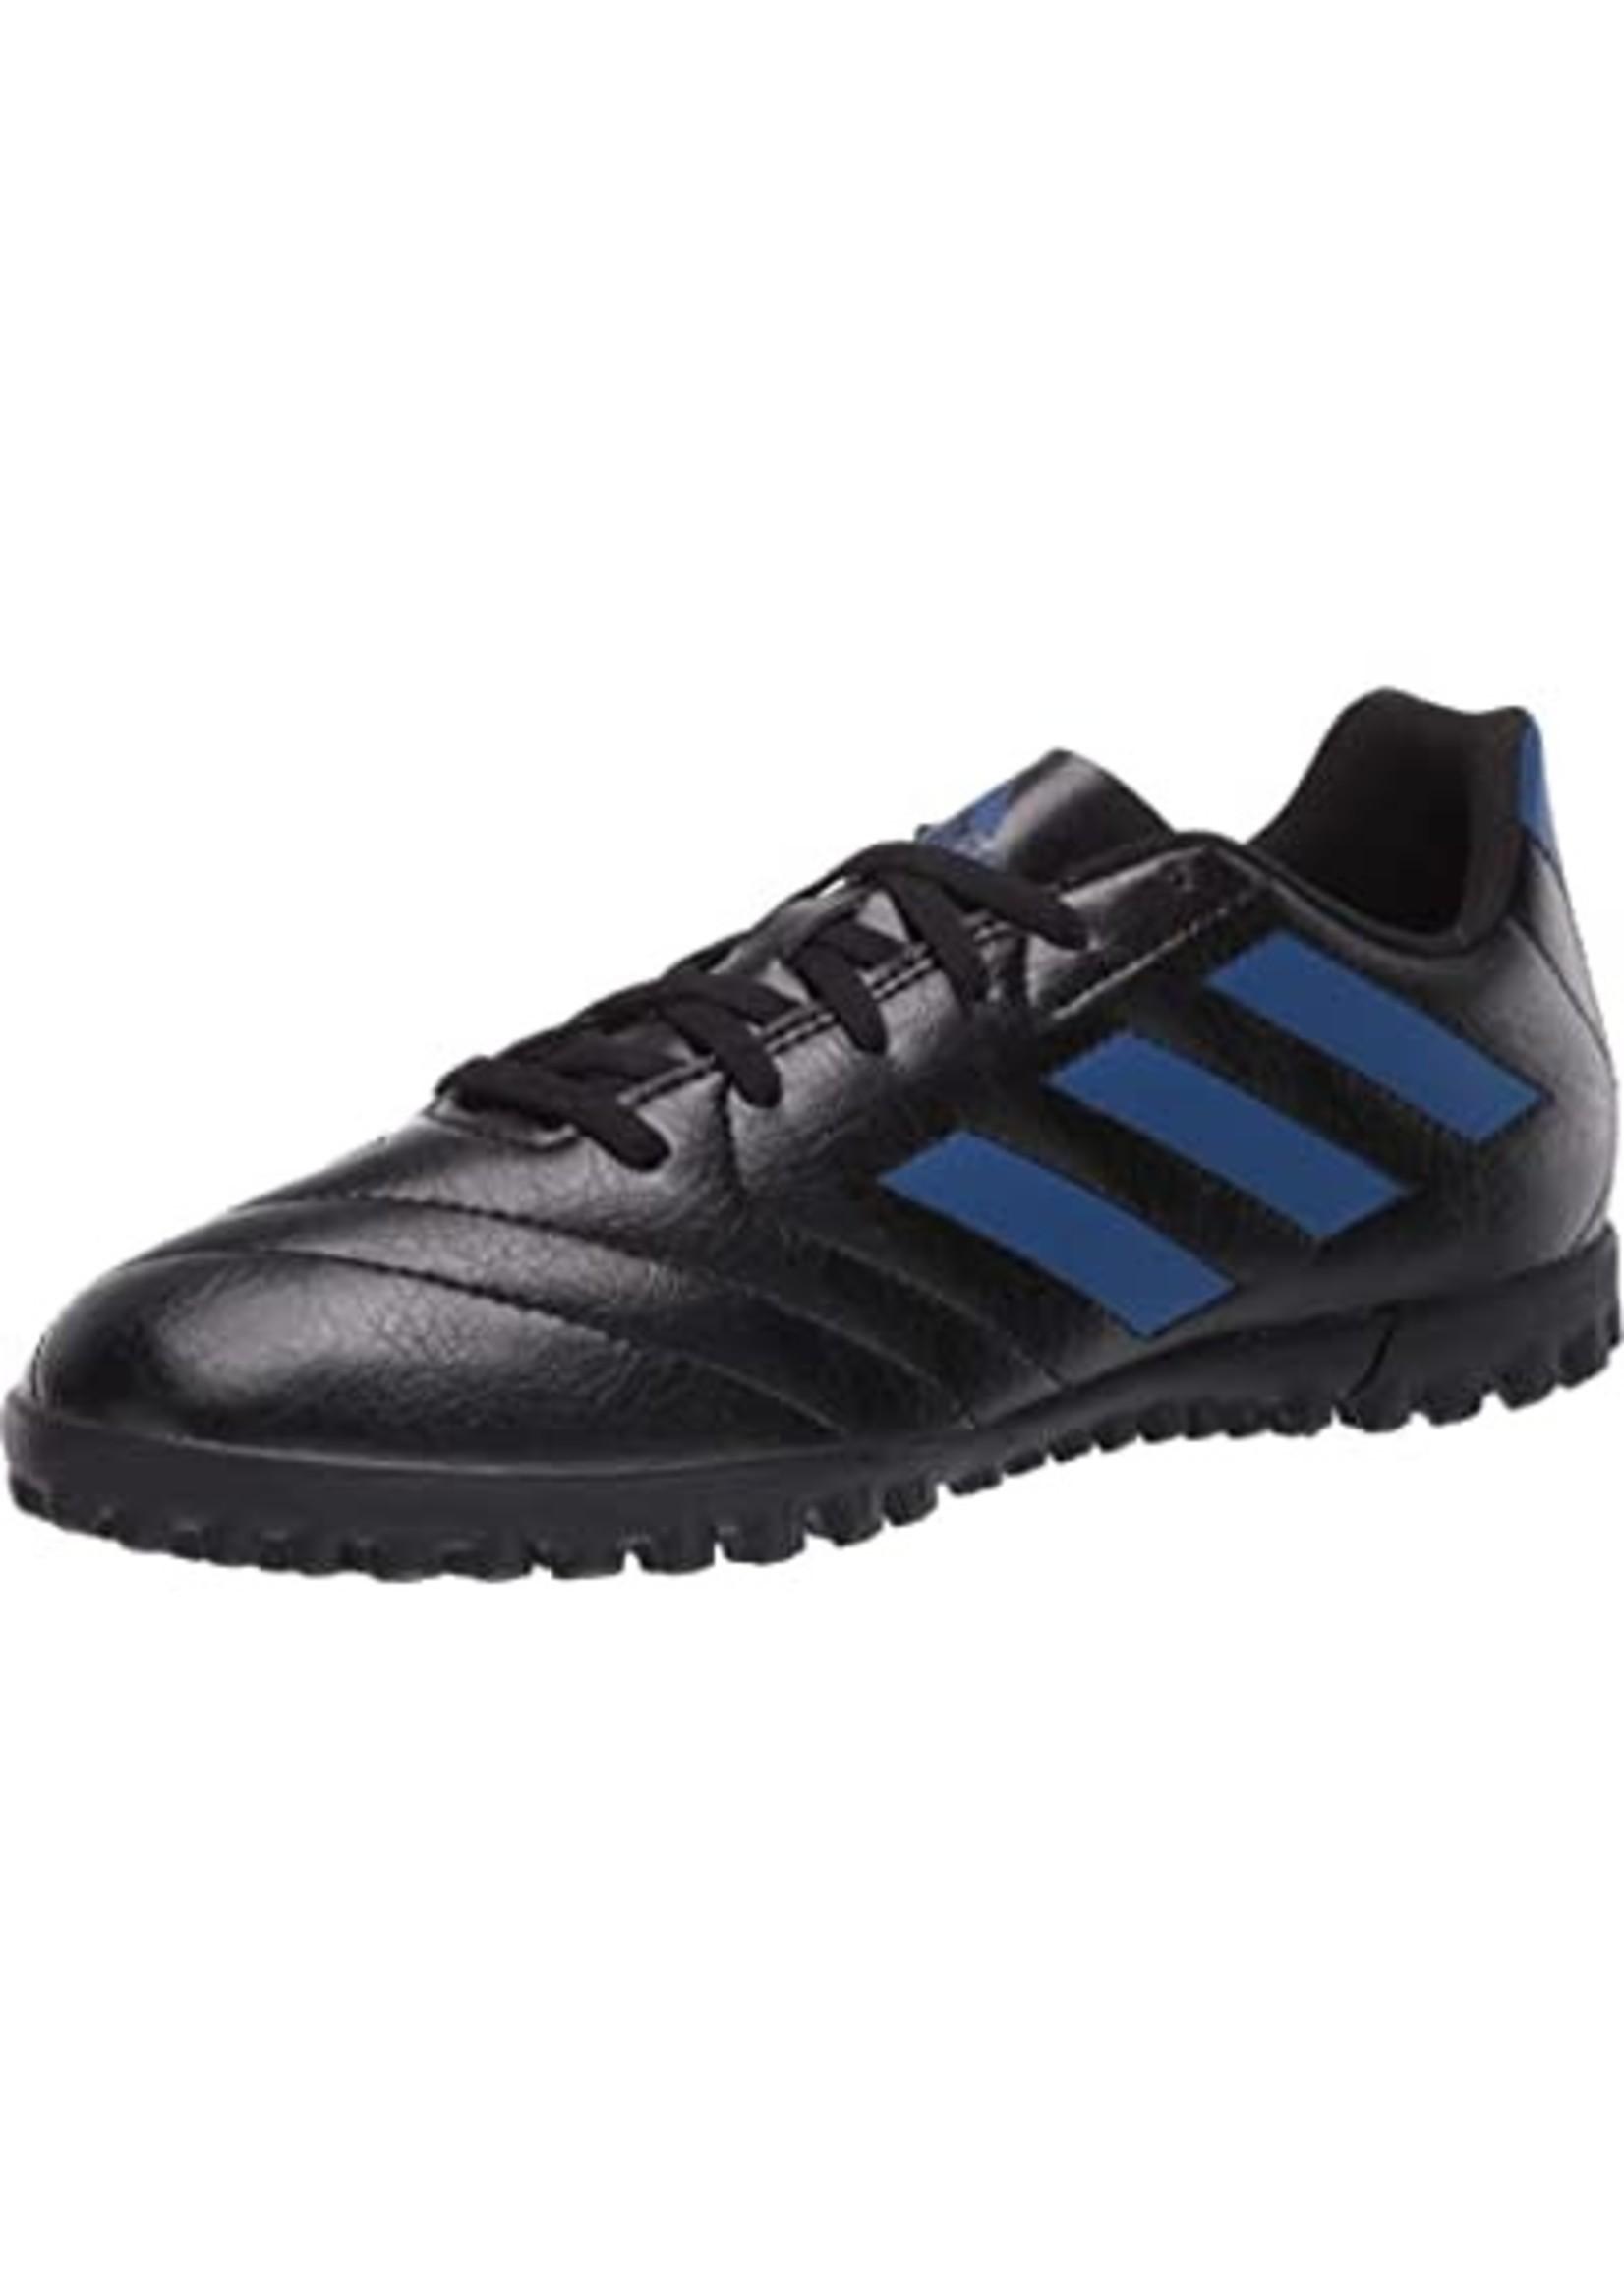 Adidas GOLETTO VII TF J